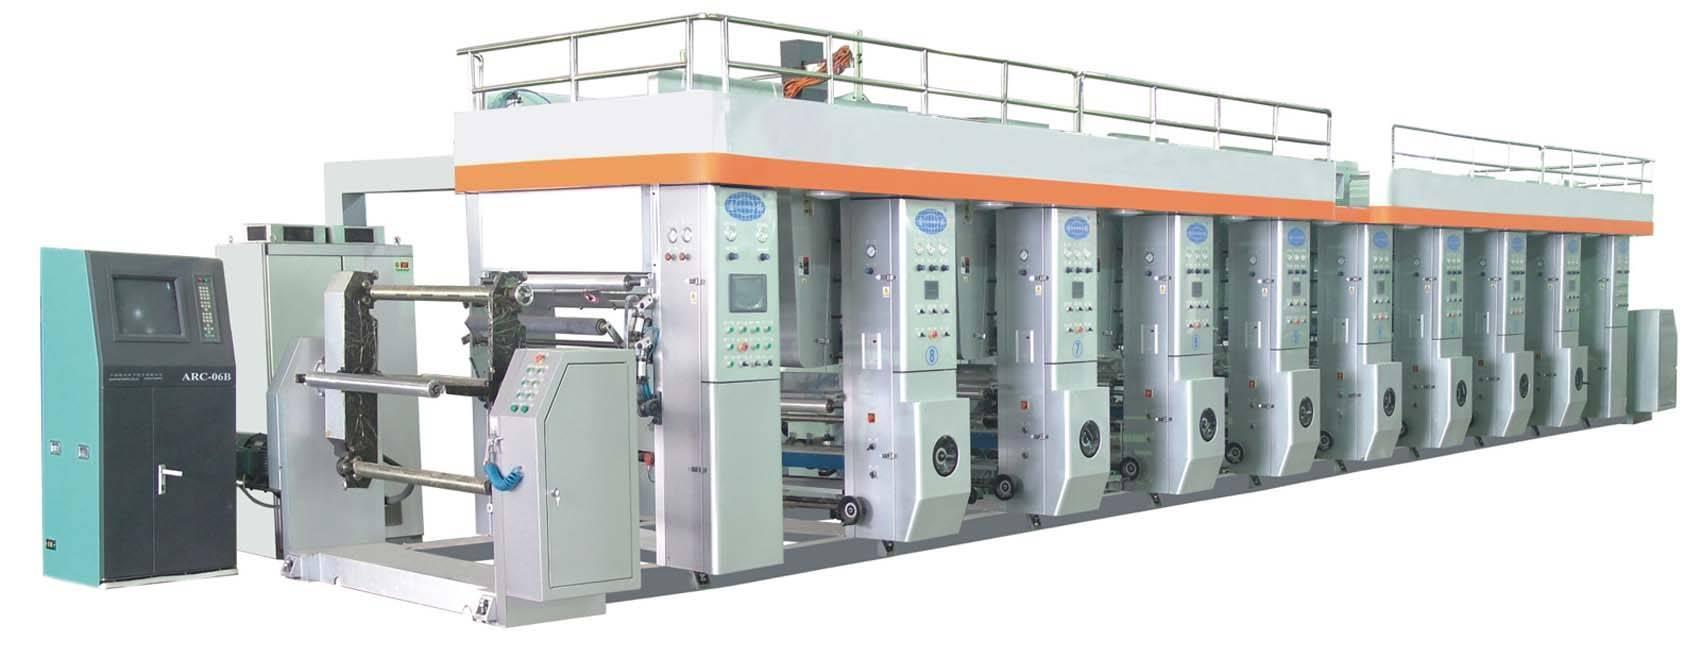 Gravure Printing Machine (HPRT600-1200A)